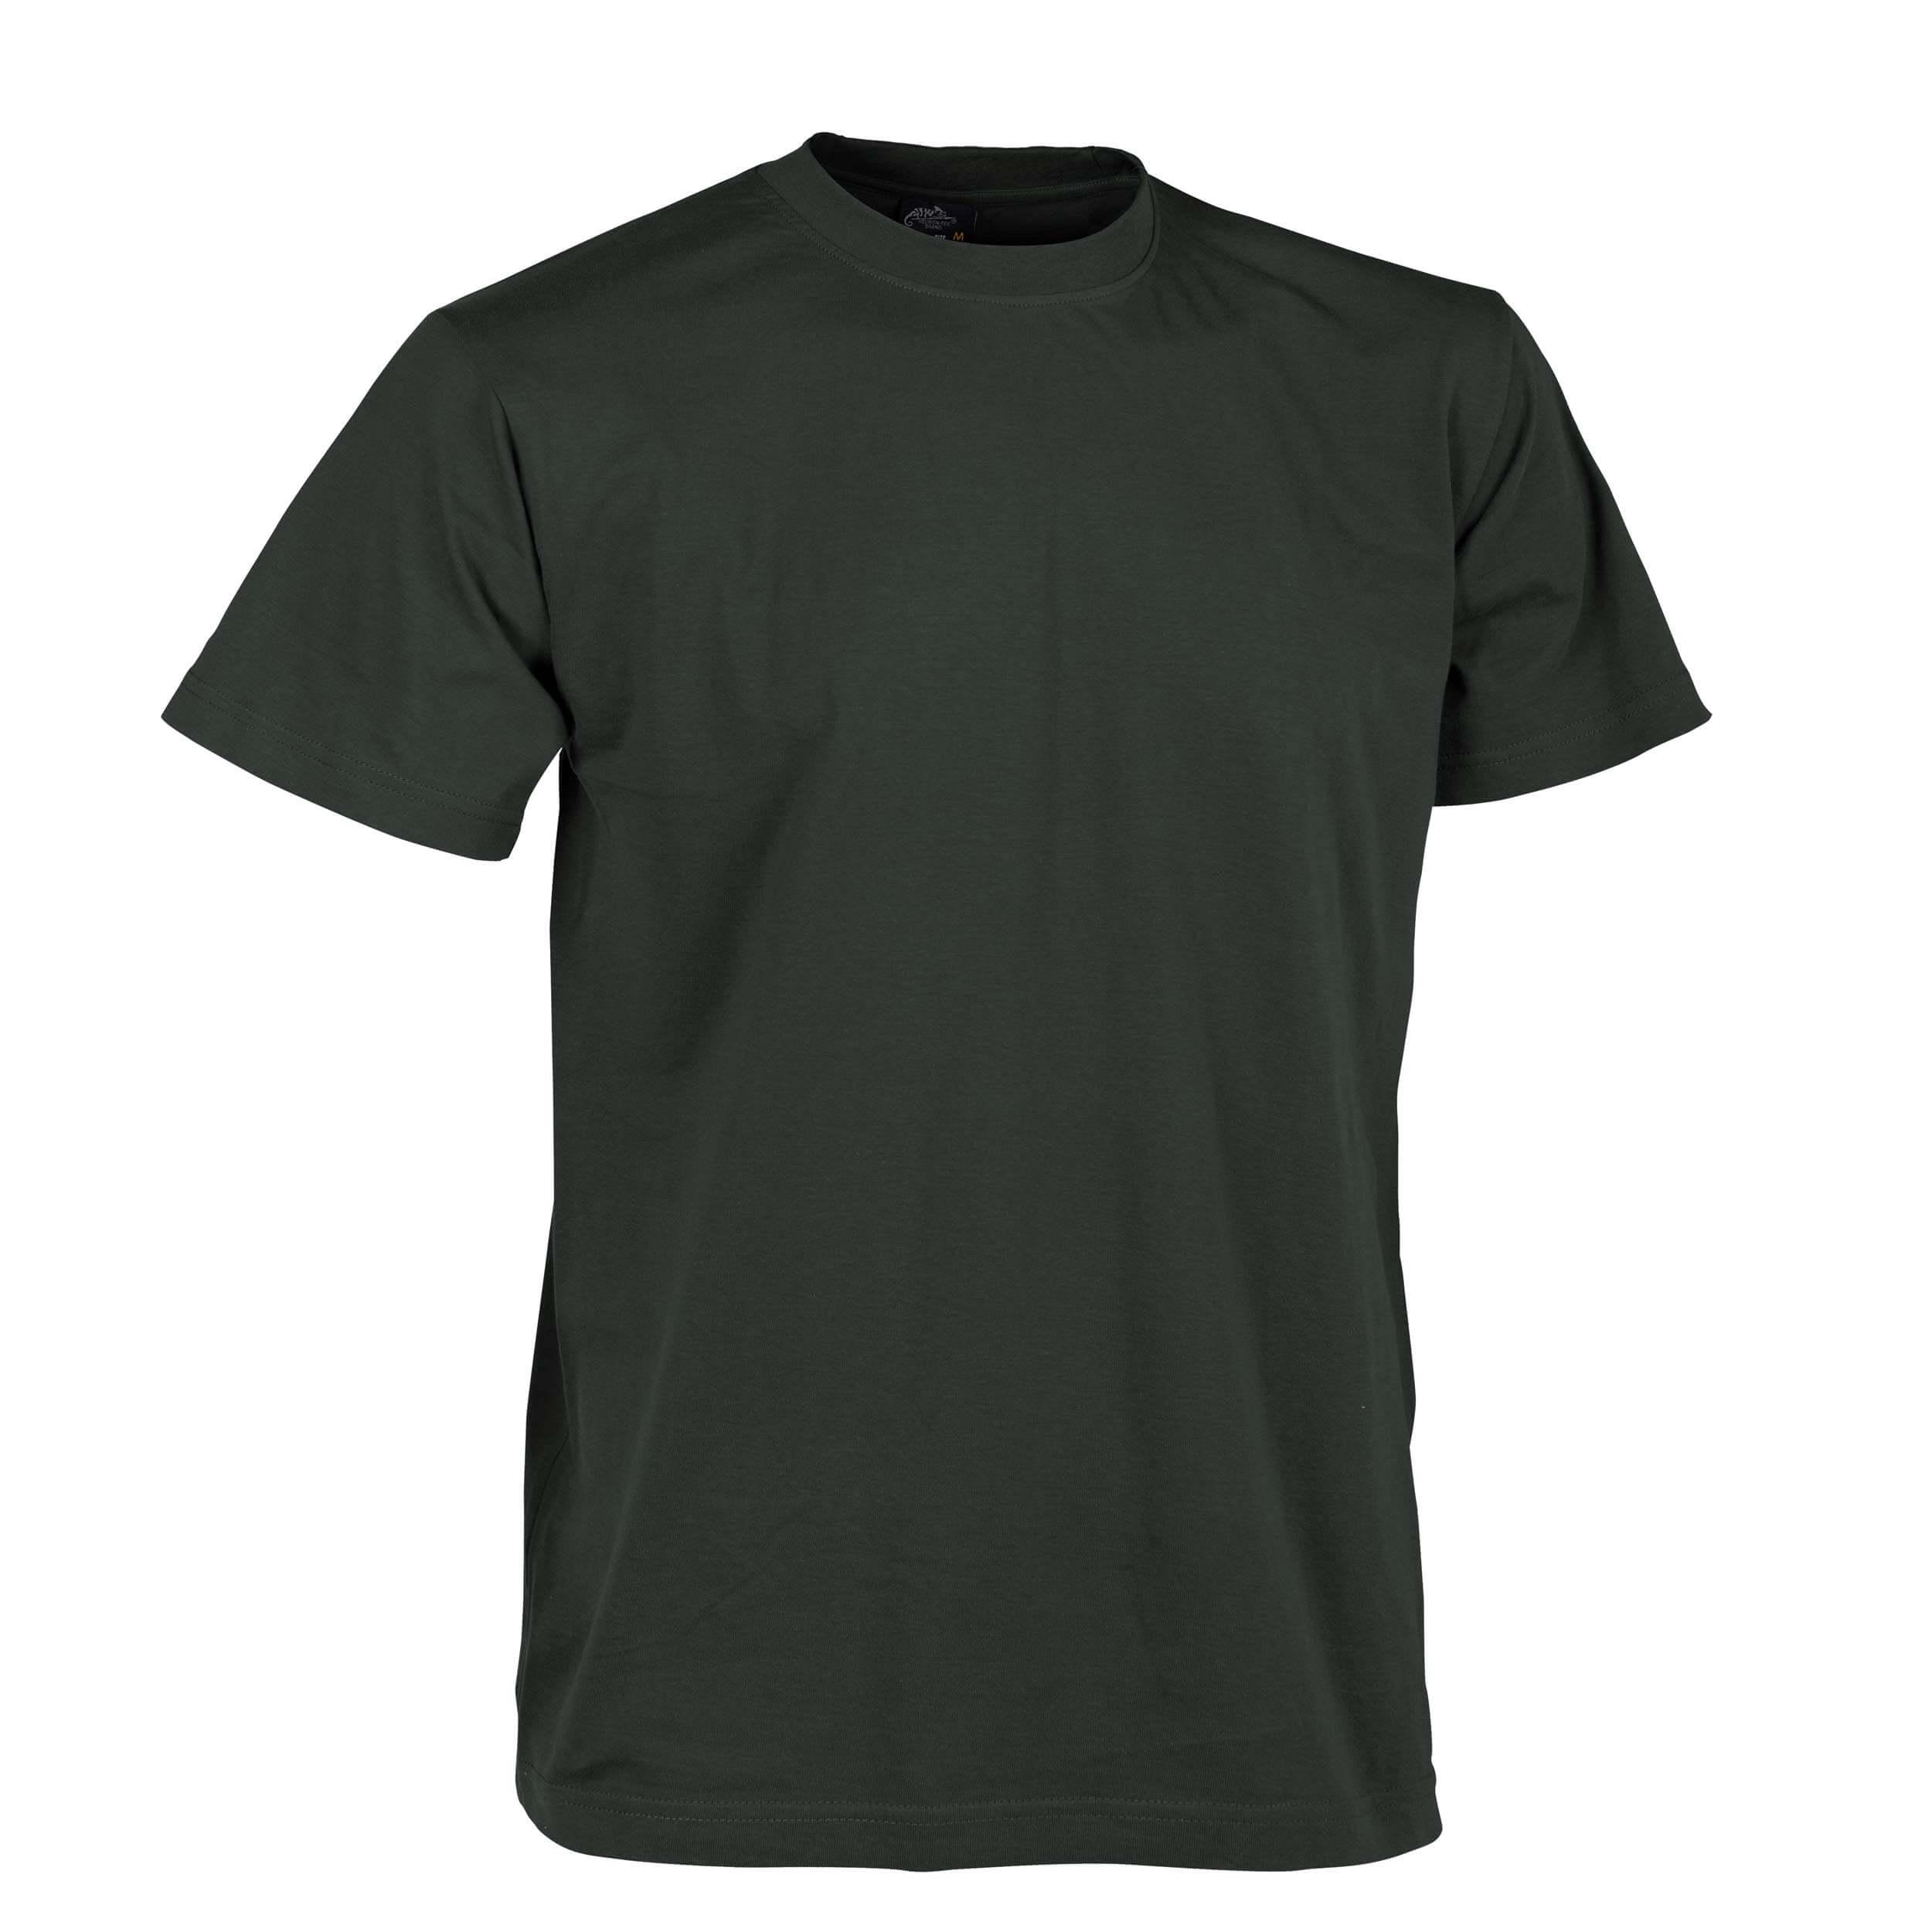 Helikon-Tex Classic Army T-Shirt Jungle Green